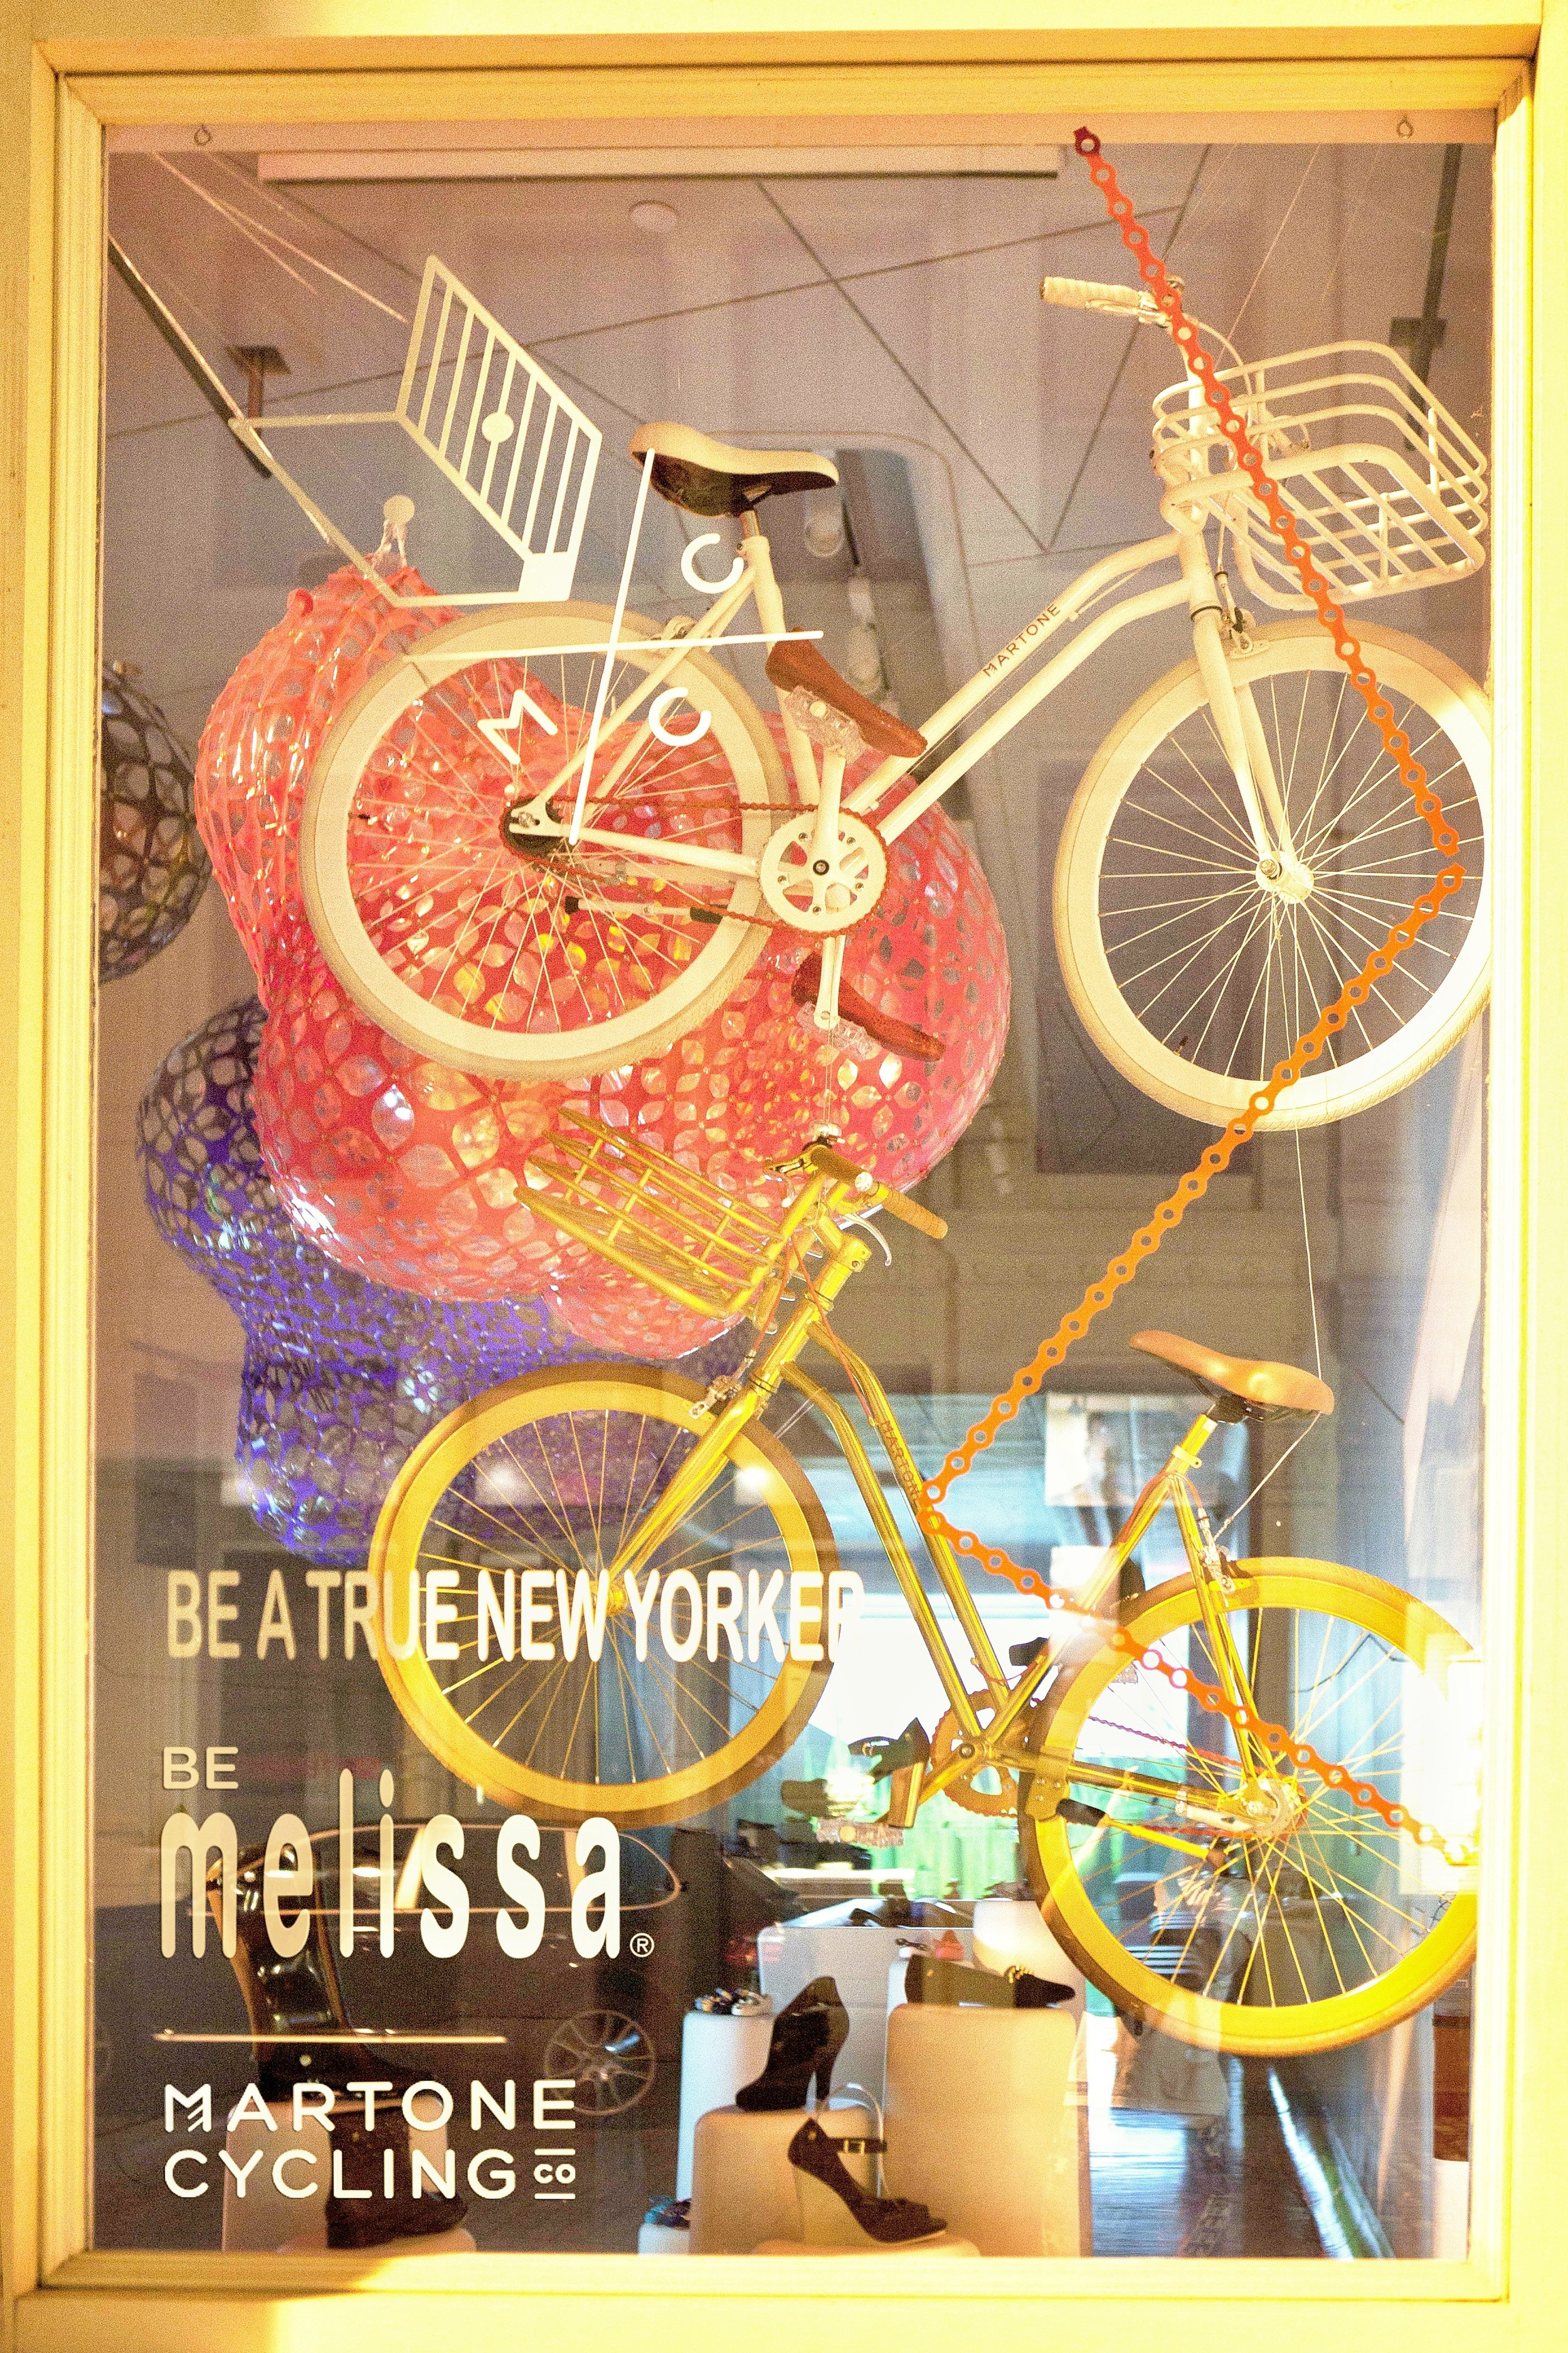 bike pretty, bikepretty, pretty bike, girls on bikes, cycle style, fashion bike, bike fashion, bike chic, bike style, cycle chic, martone, melissa, melissa shoes, martone cycling co, new york, be melissa, galeria melissa, bike in heels, be a true new yorker, window display